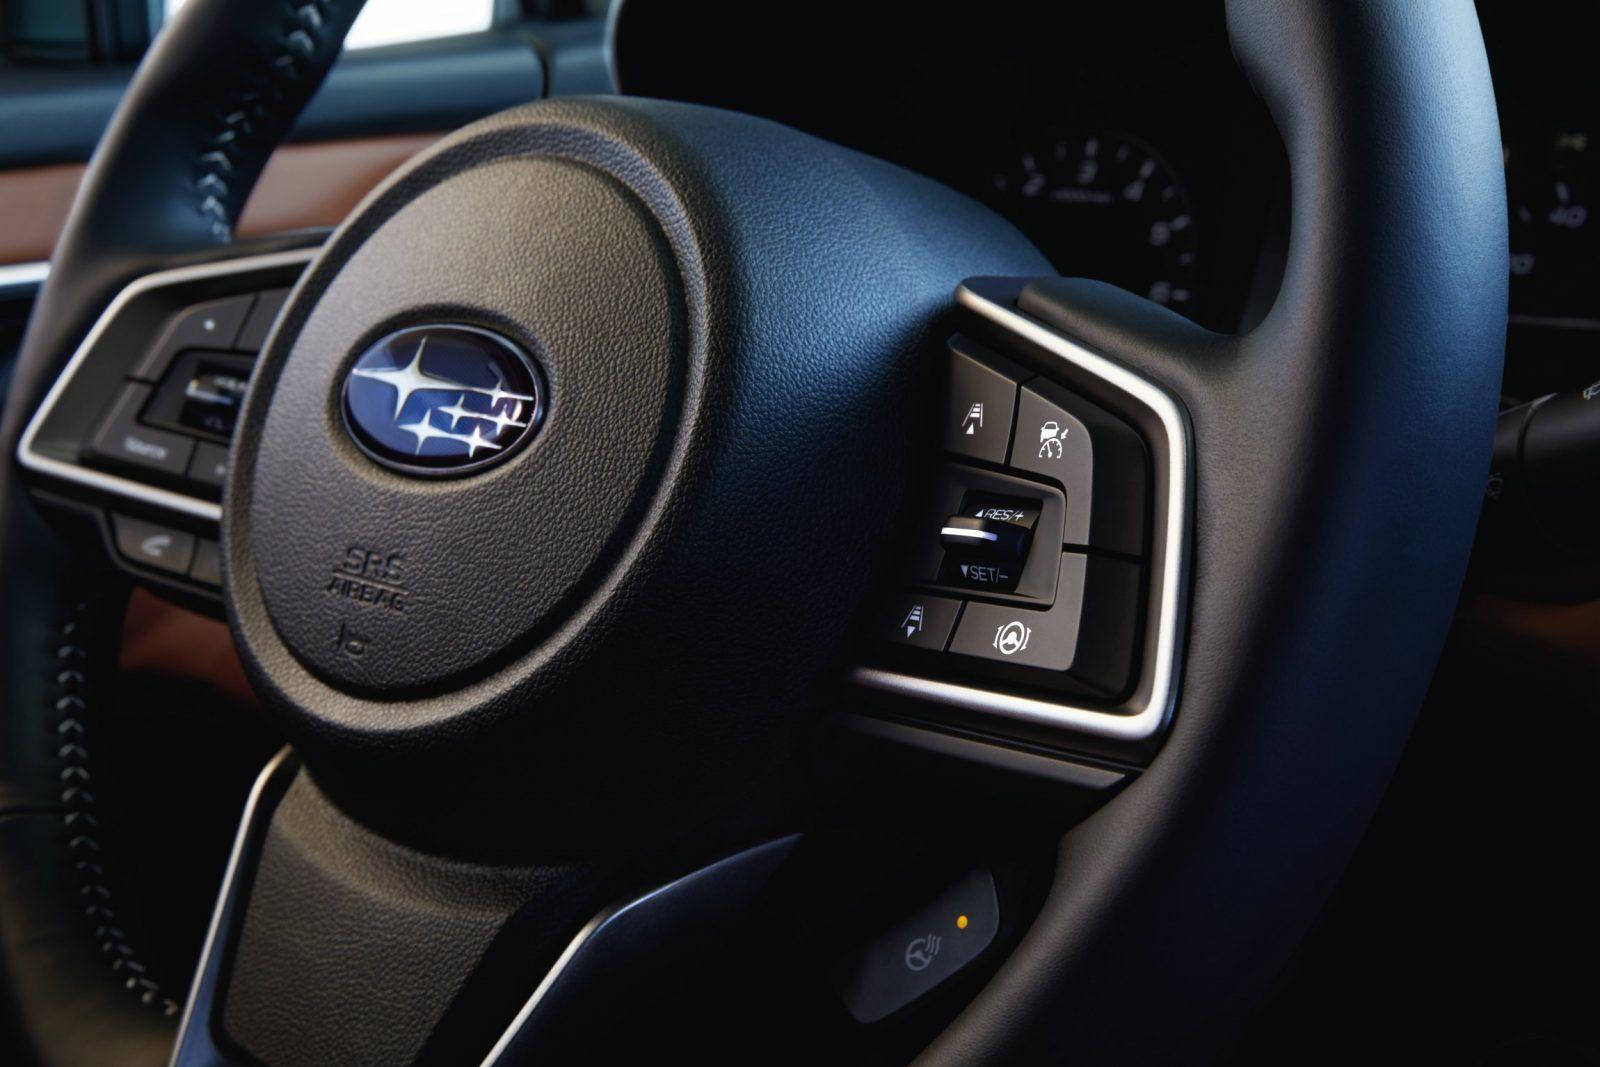 2020 Subaru Legacy Brings Big Screen And Turbocharged Power To Eager Buyers Video Subaru Legacy Subaru Fuel Economy